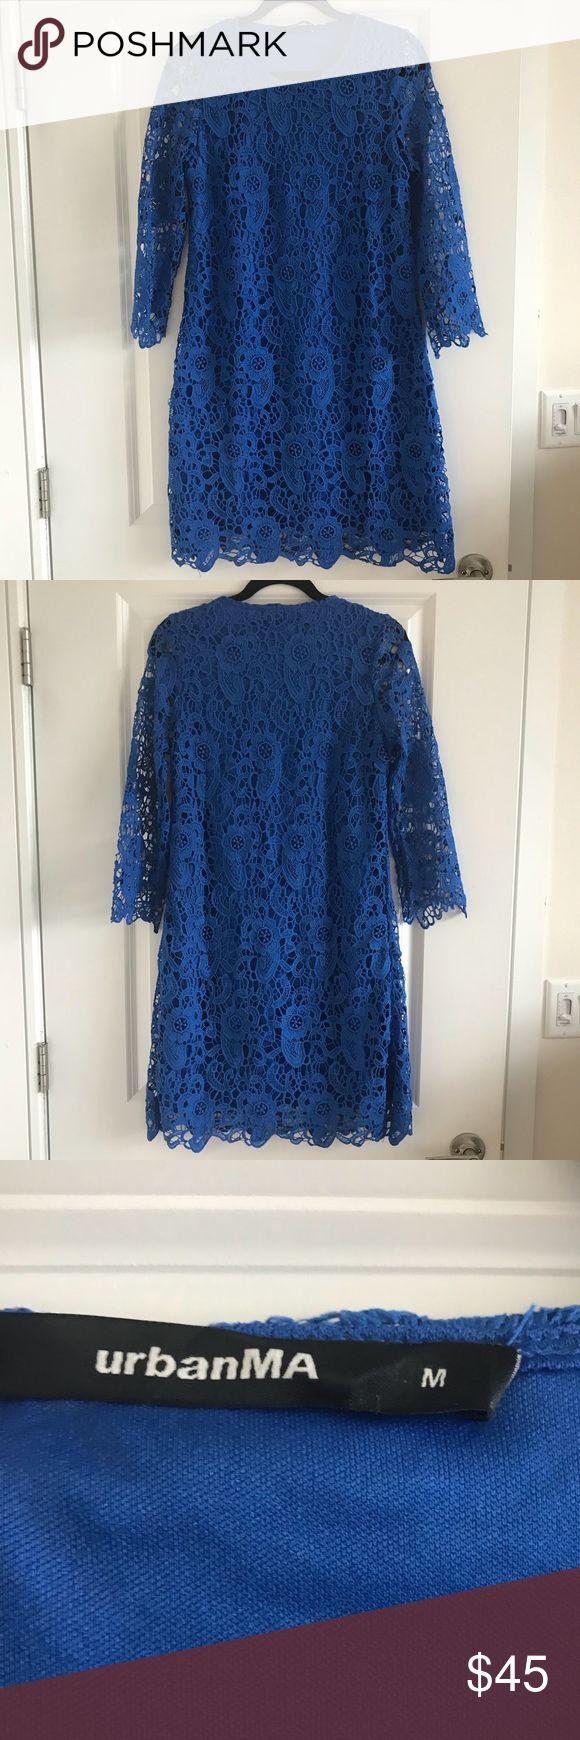 25 unique crochet maternity dresses ideas on pinterest pregnacy urbanma crochet maternity shift dress ombrellifo Image collections